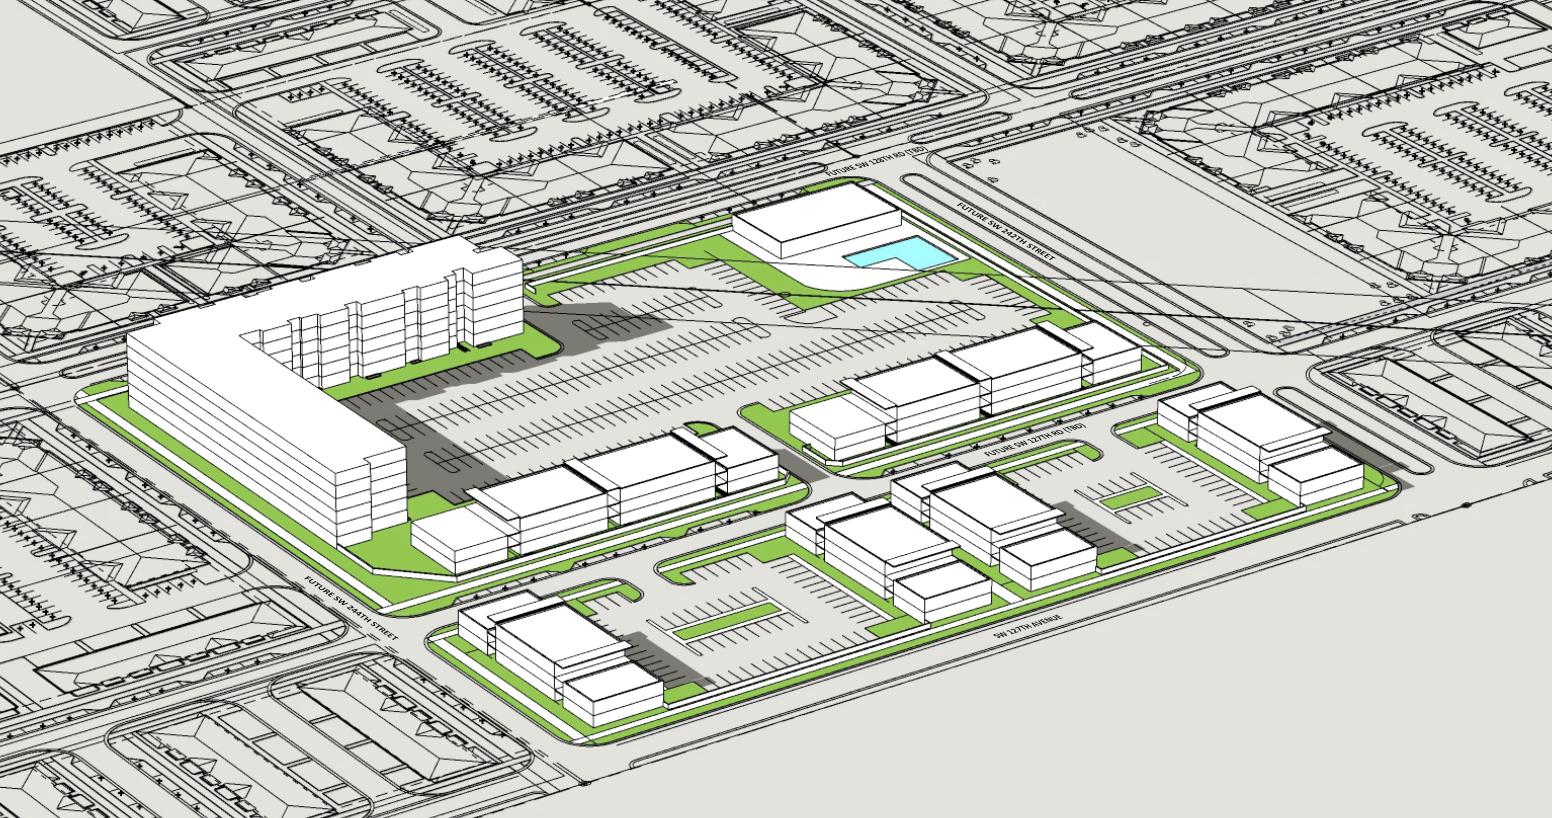 Princeton Landings. Designed by Chisholm Architects.